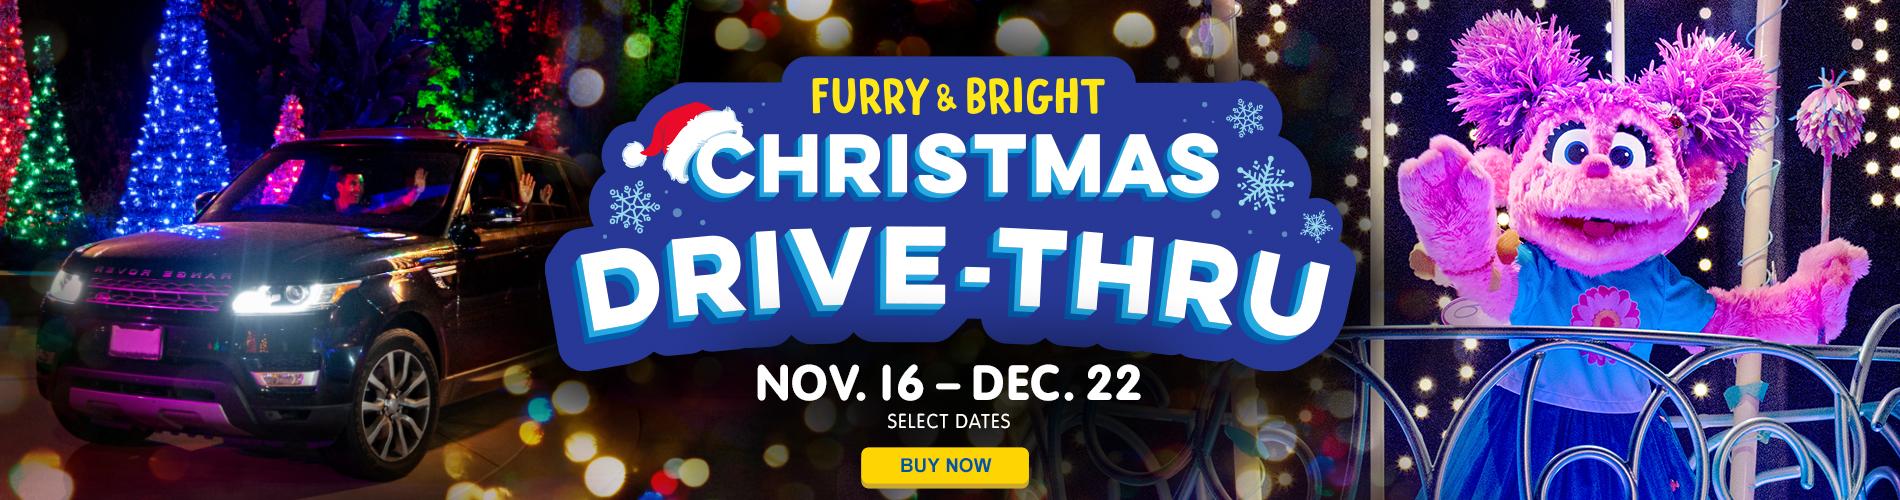 Christmas Drive-thru Event